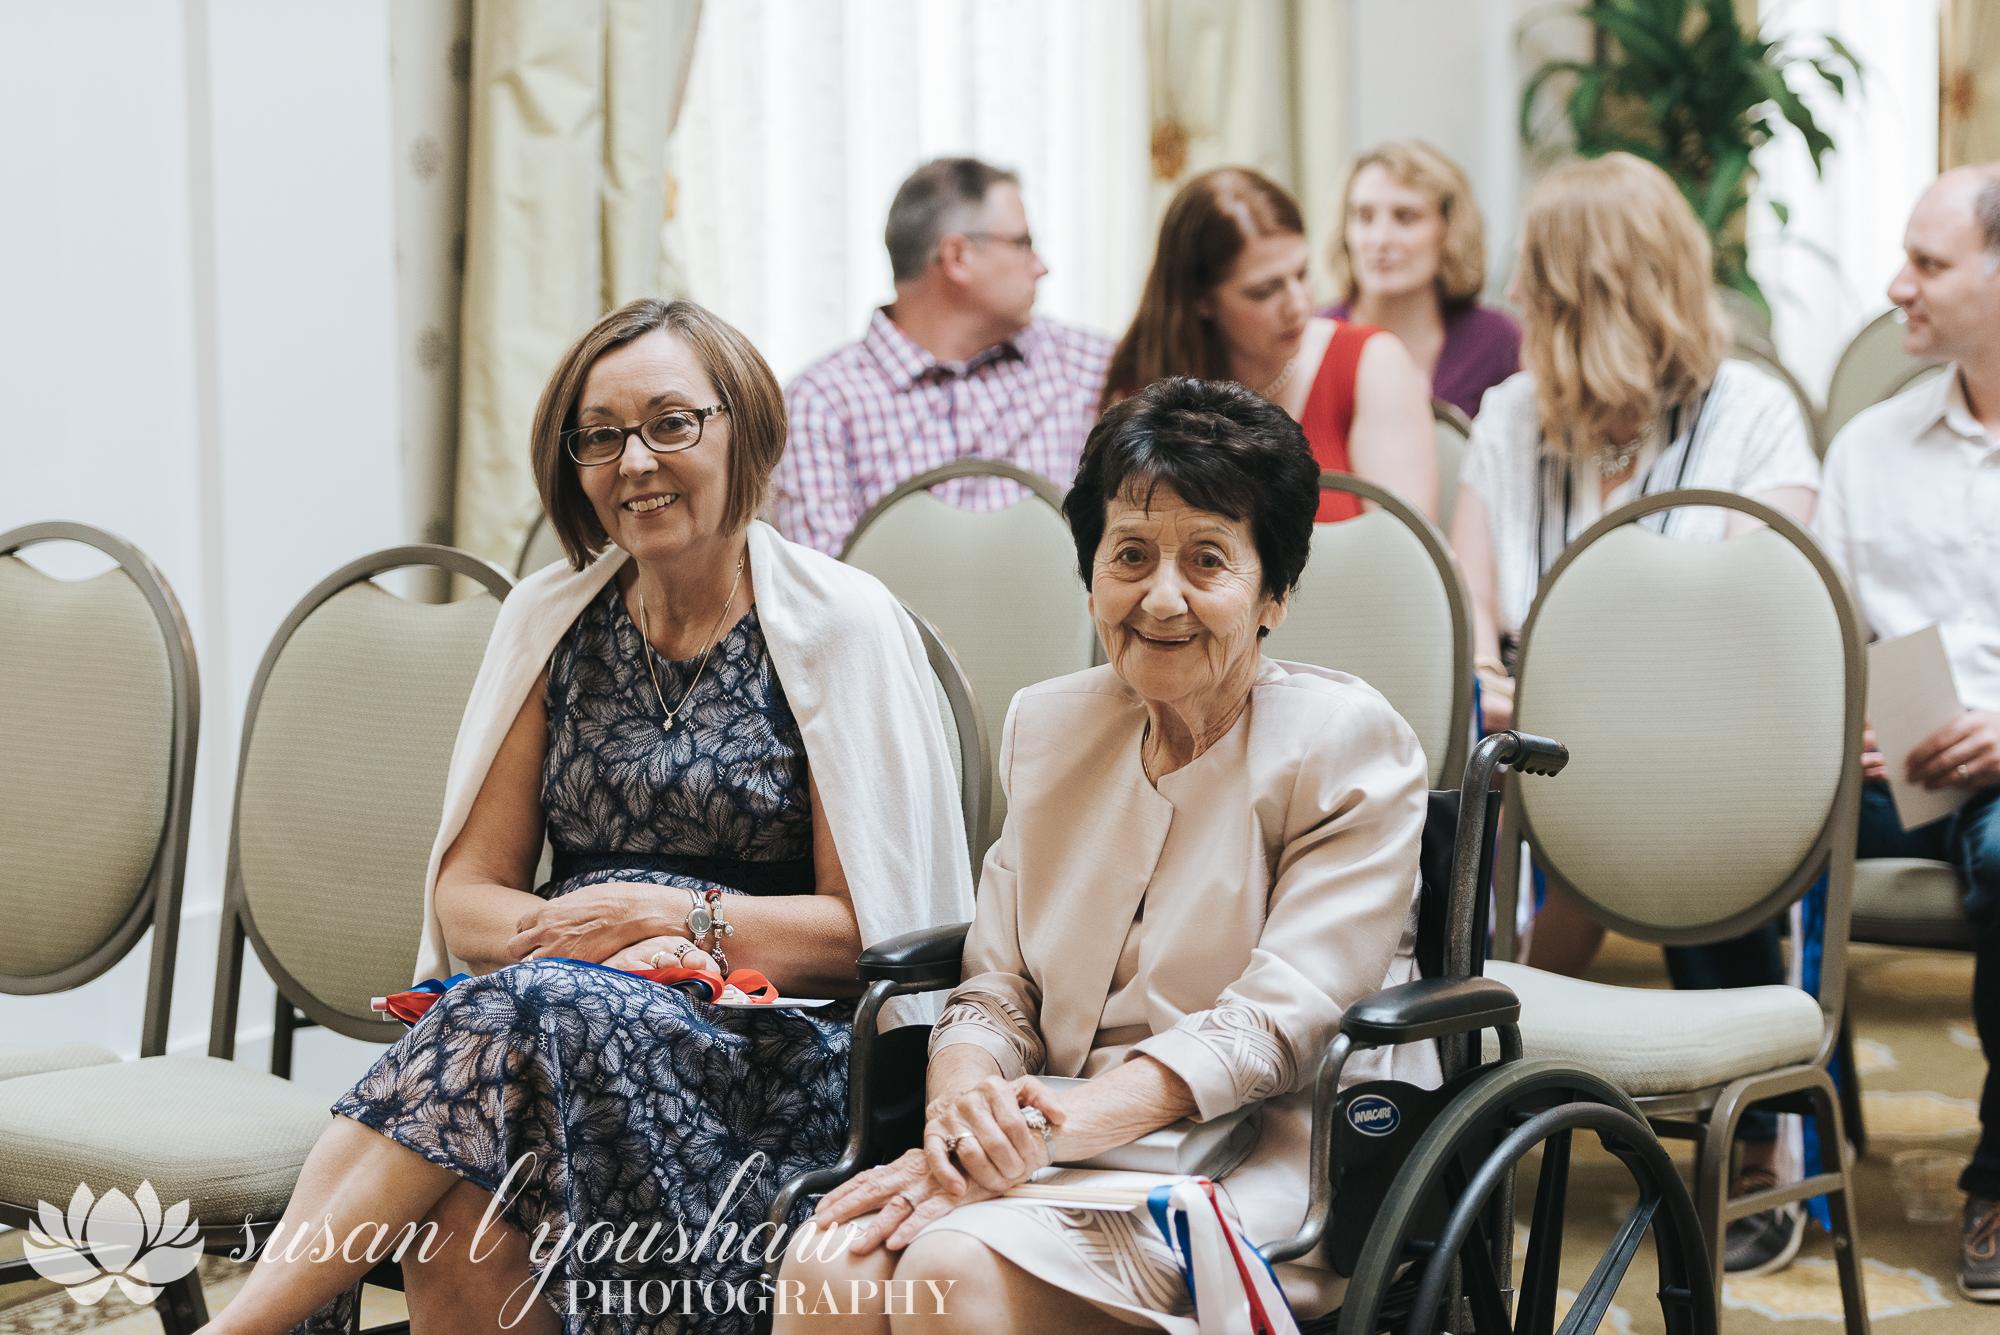 BLOG Carolyn Adams and Jim McCune 07-04-2018 SLY Photography-52.jpg